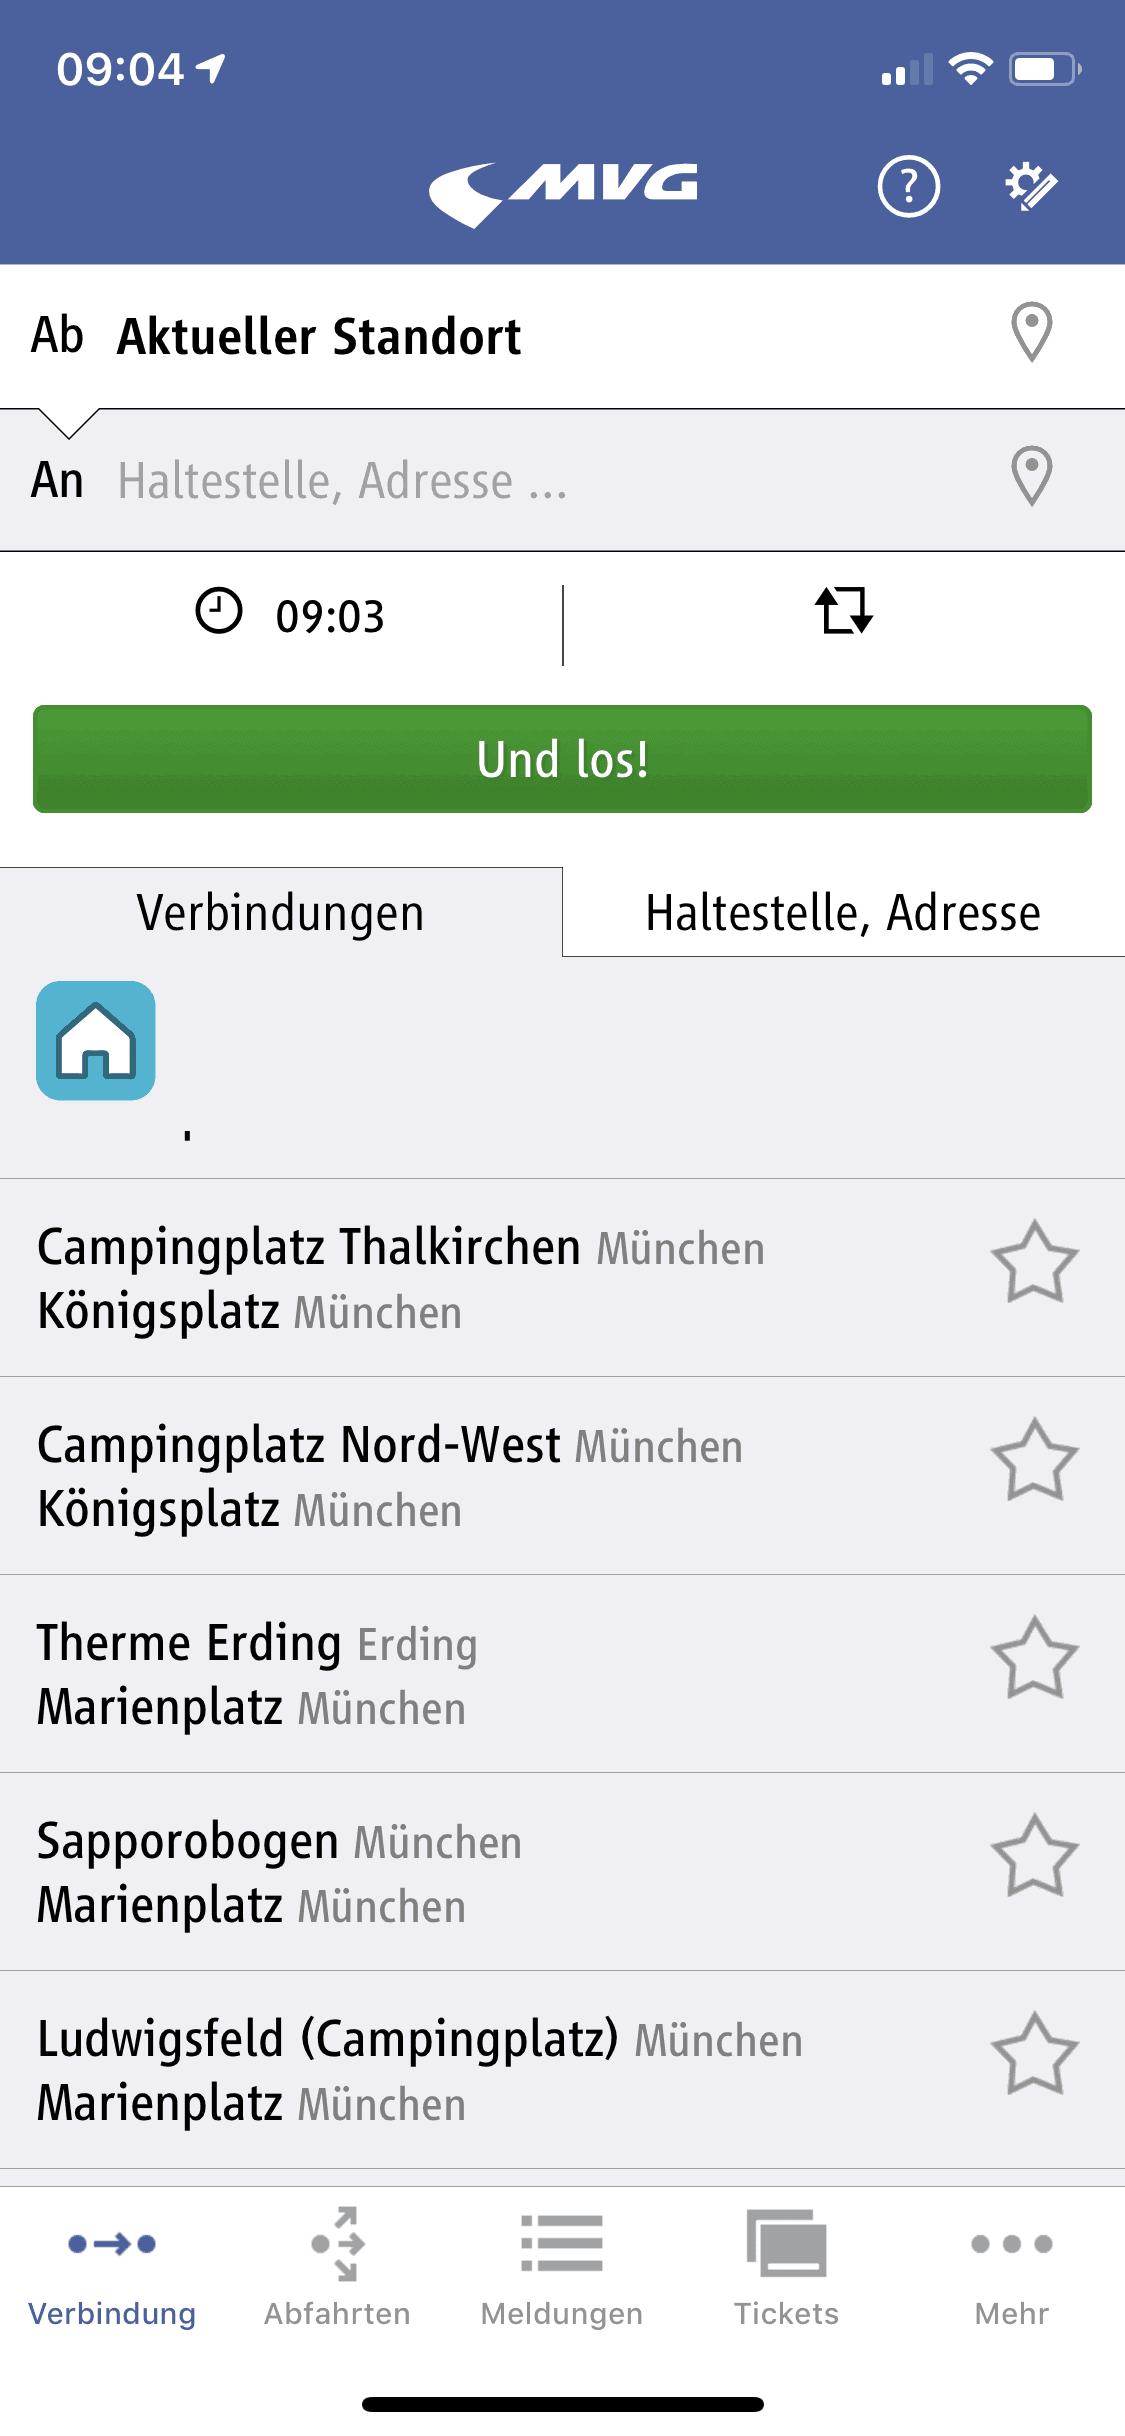 München_MVG_Fahrinfo_Verbindung